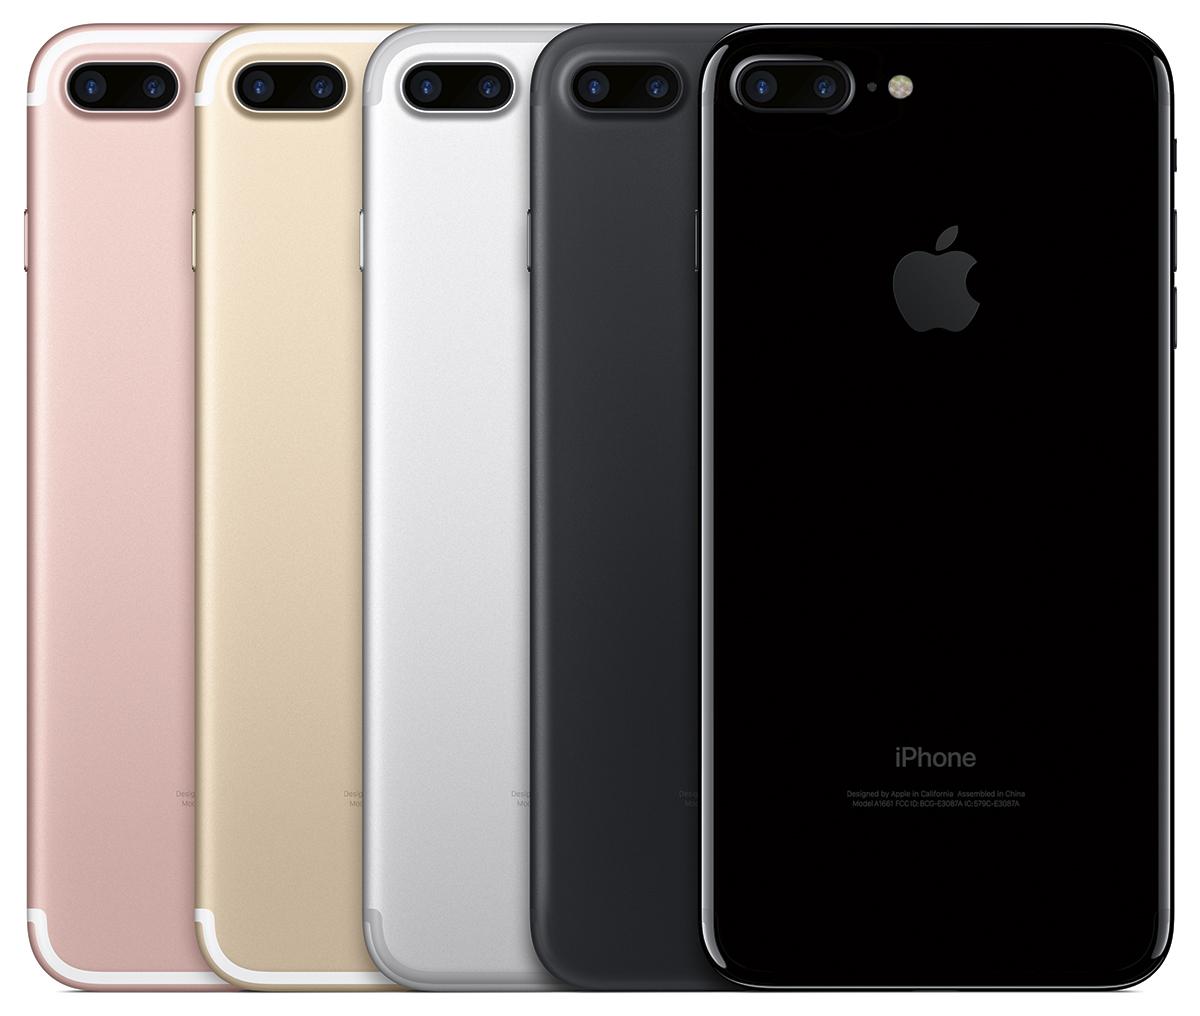 https://www.macfreak.nl/modules/news/images/z-iPhone7Plus-Lineup.jpg